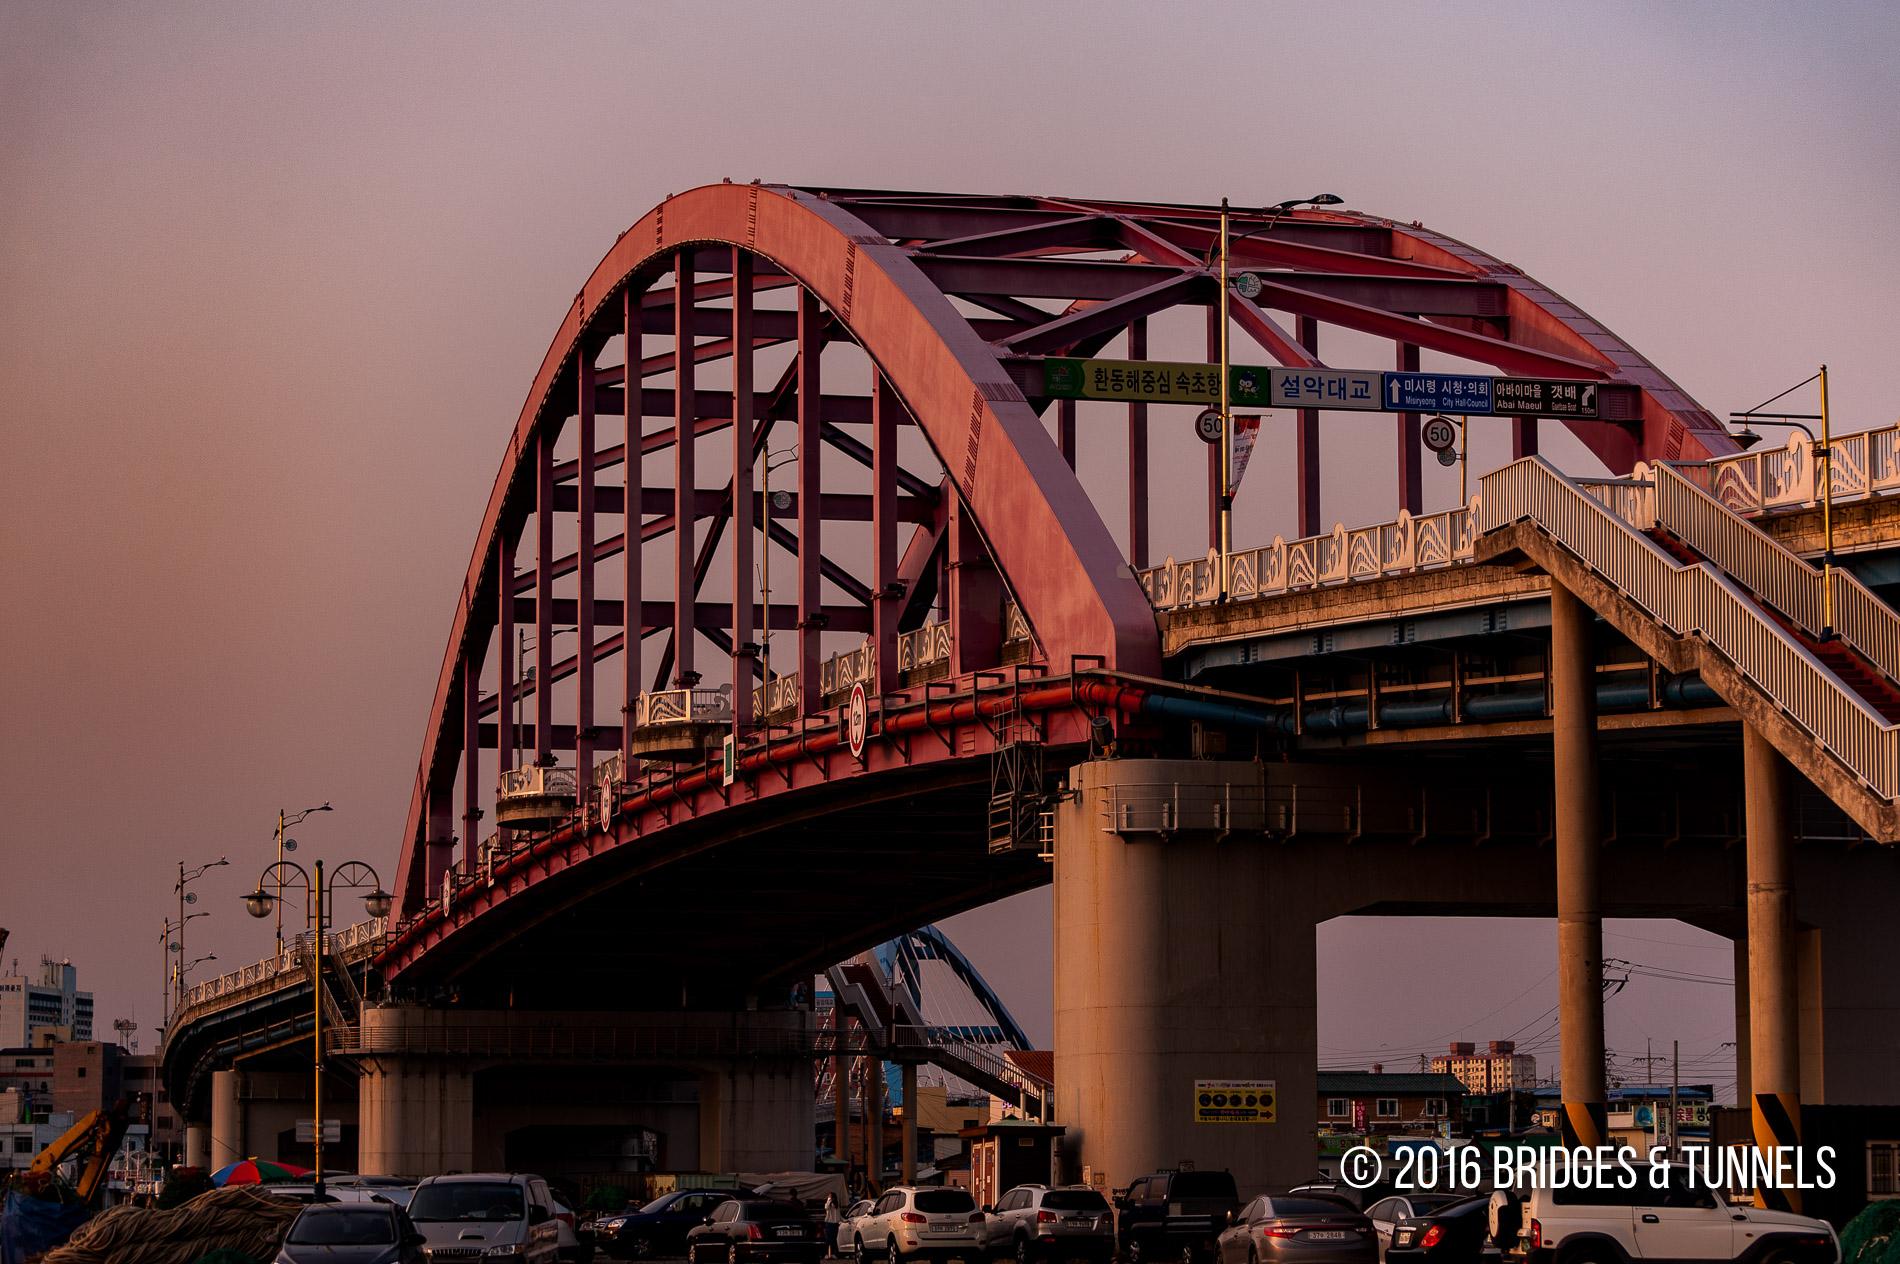 Sinsuro Arched Bridge